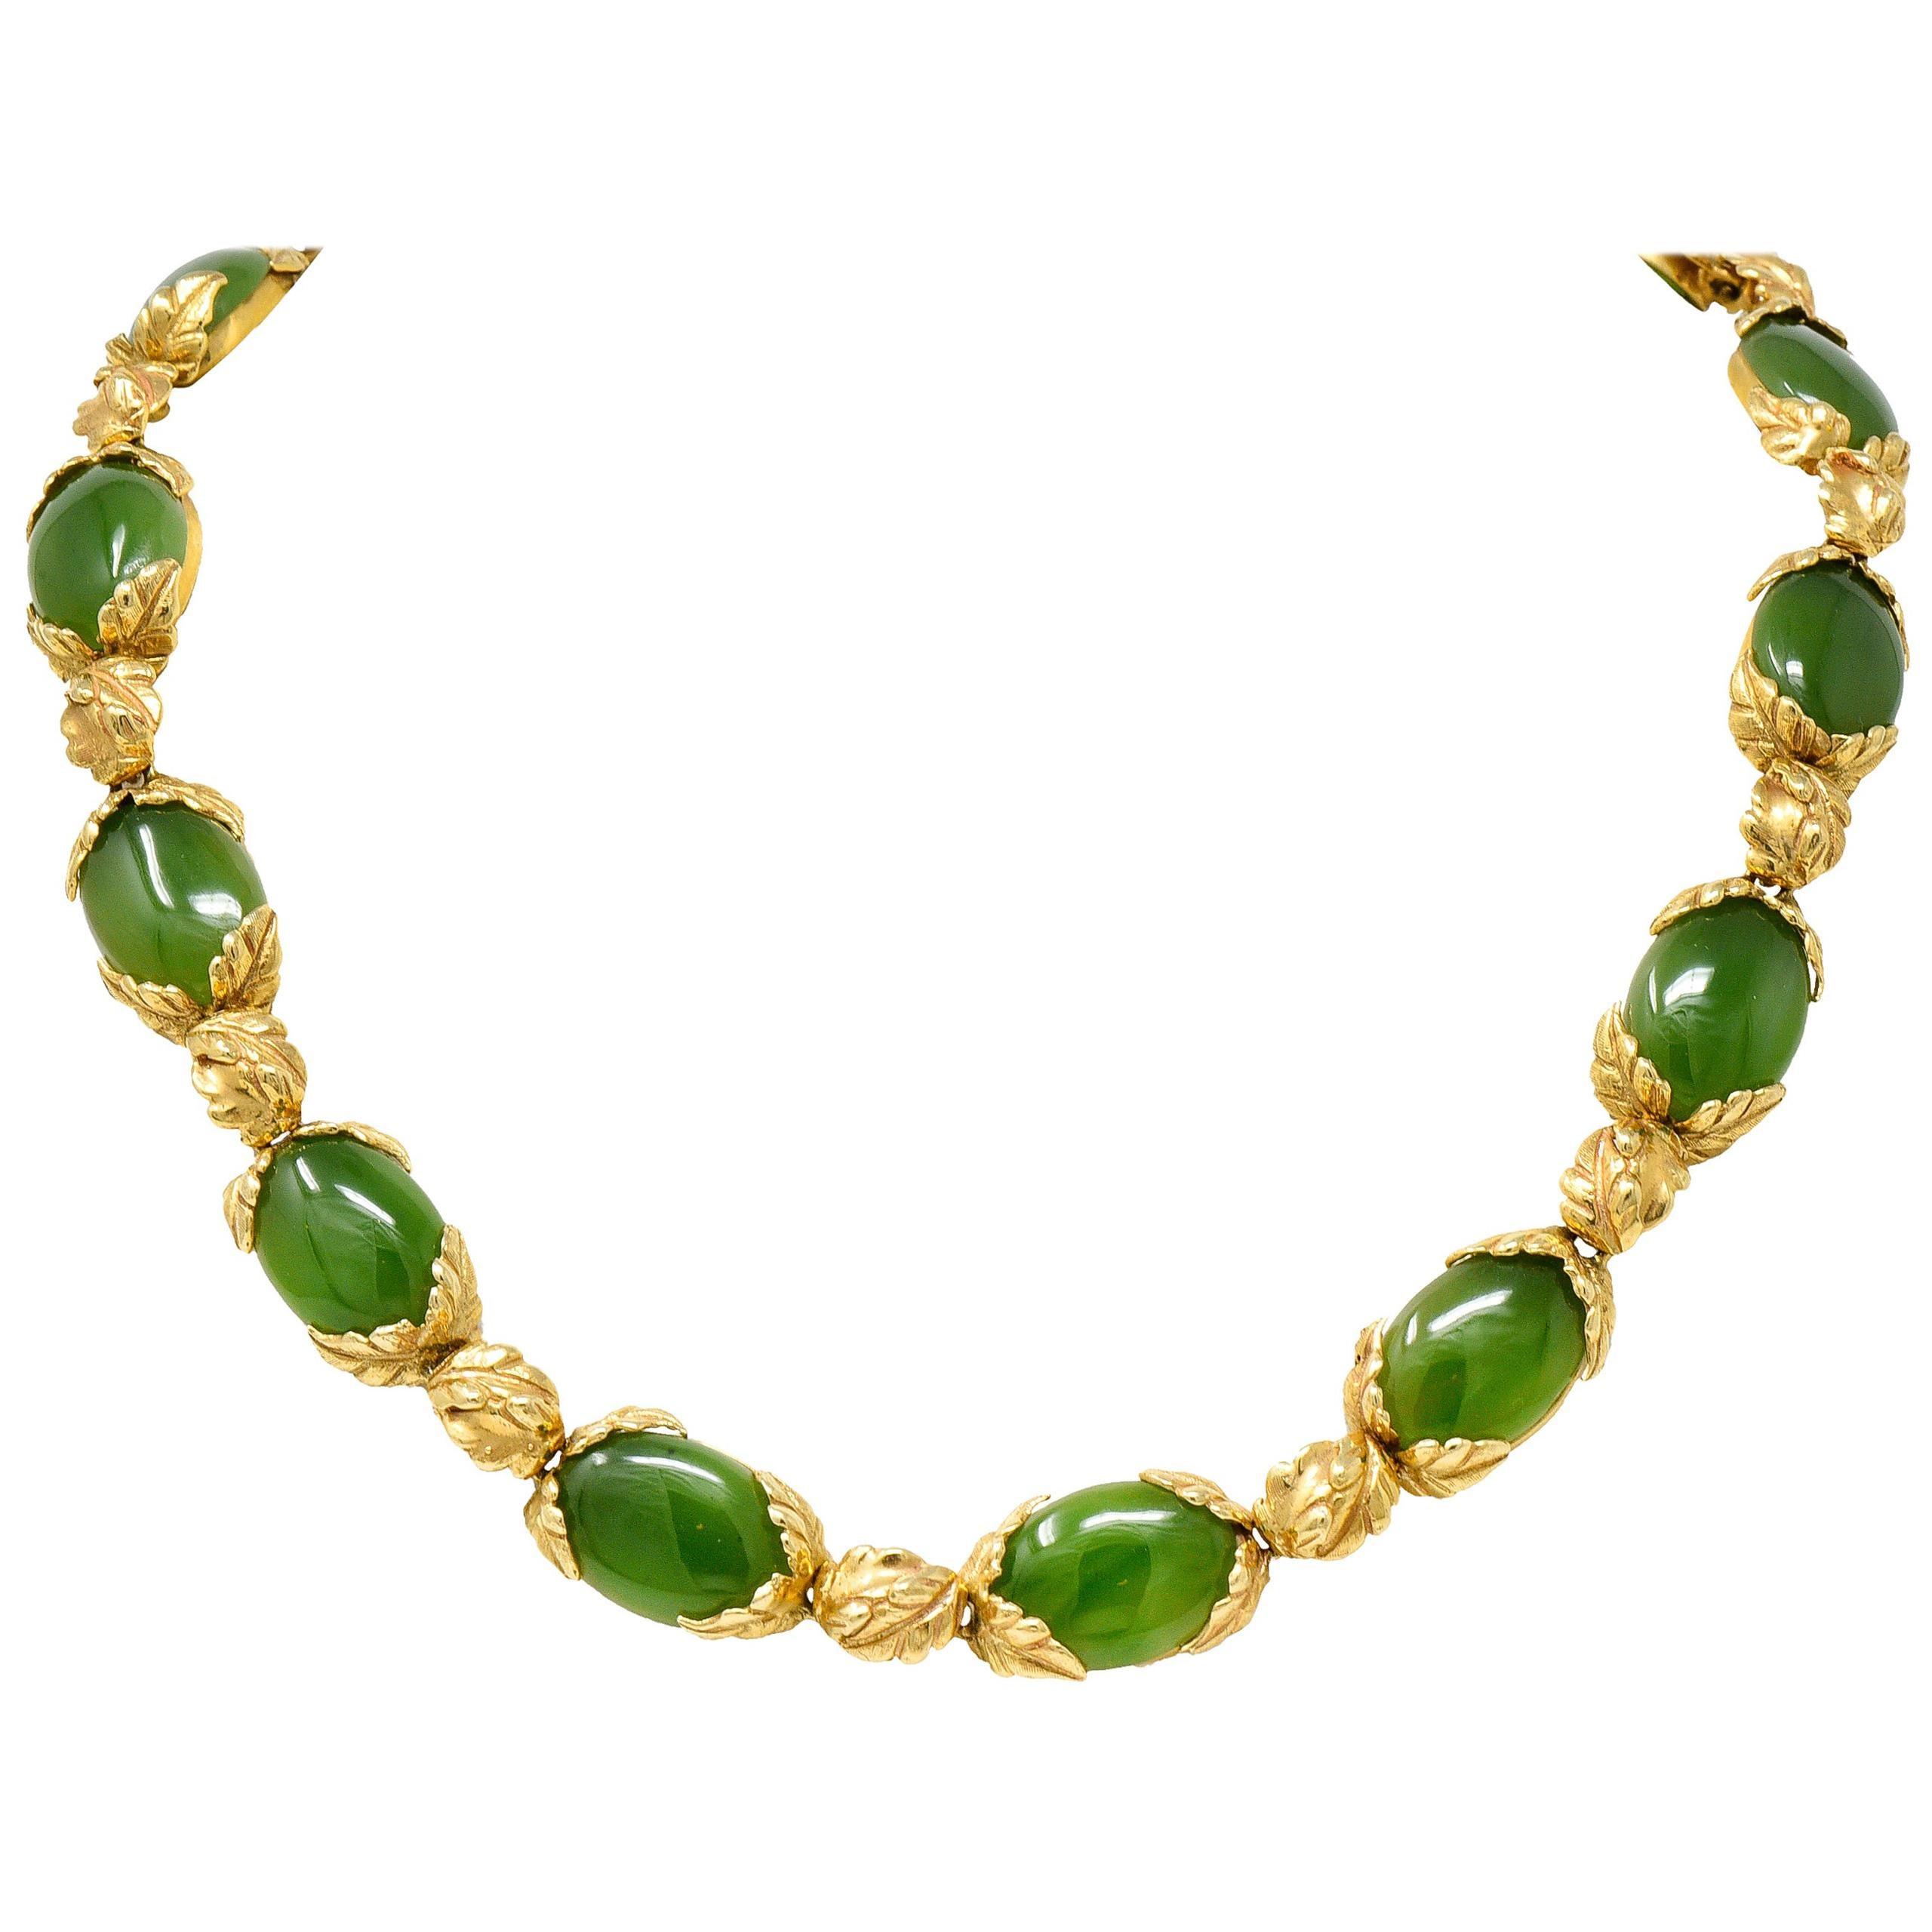 Retro Jade 14 Karat Yellow Gold Foliate Collar Necklace